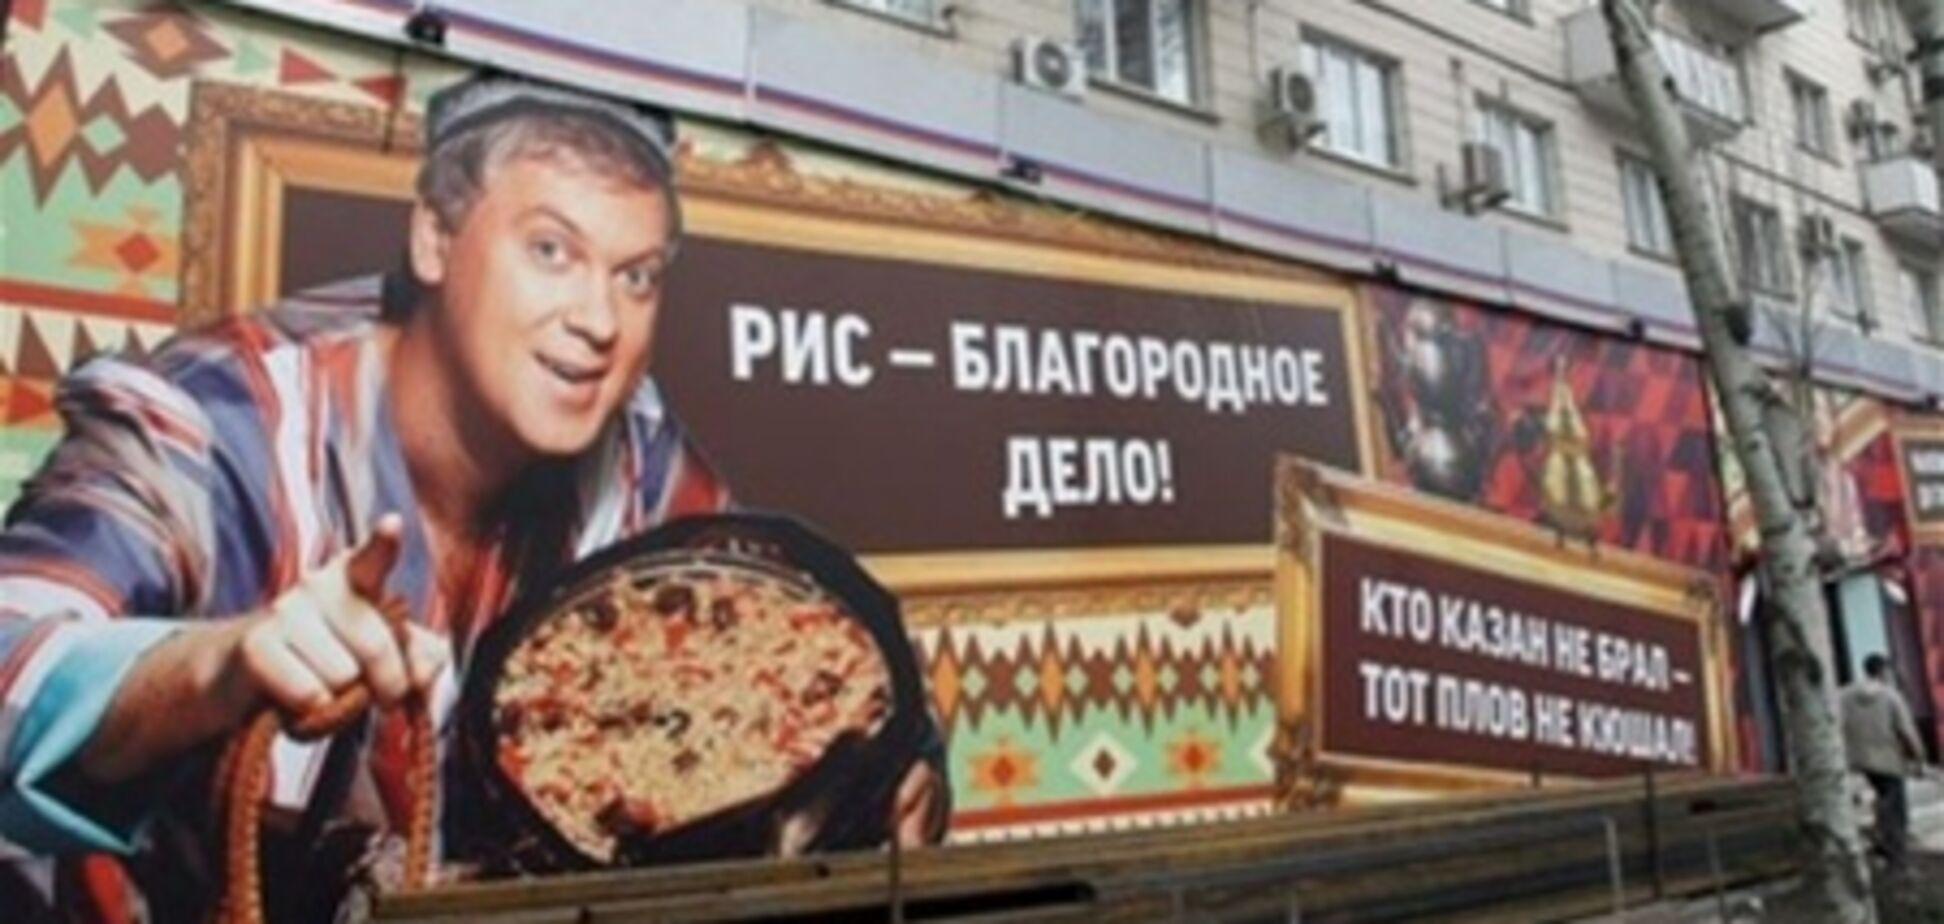 Жители Киева взбунтовались из-за ресторана Светлакова